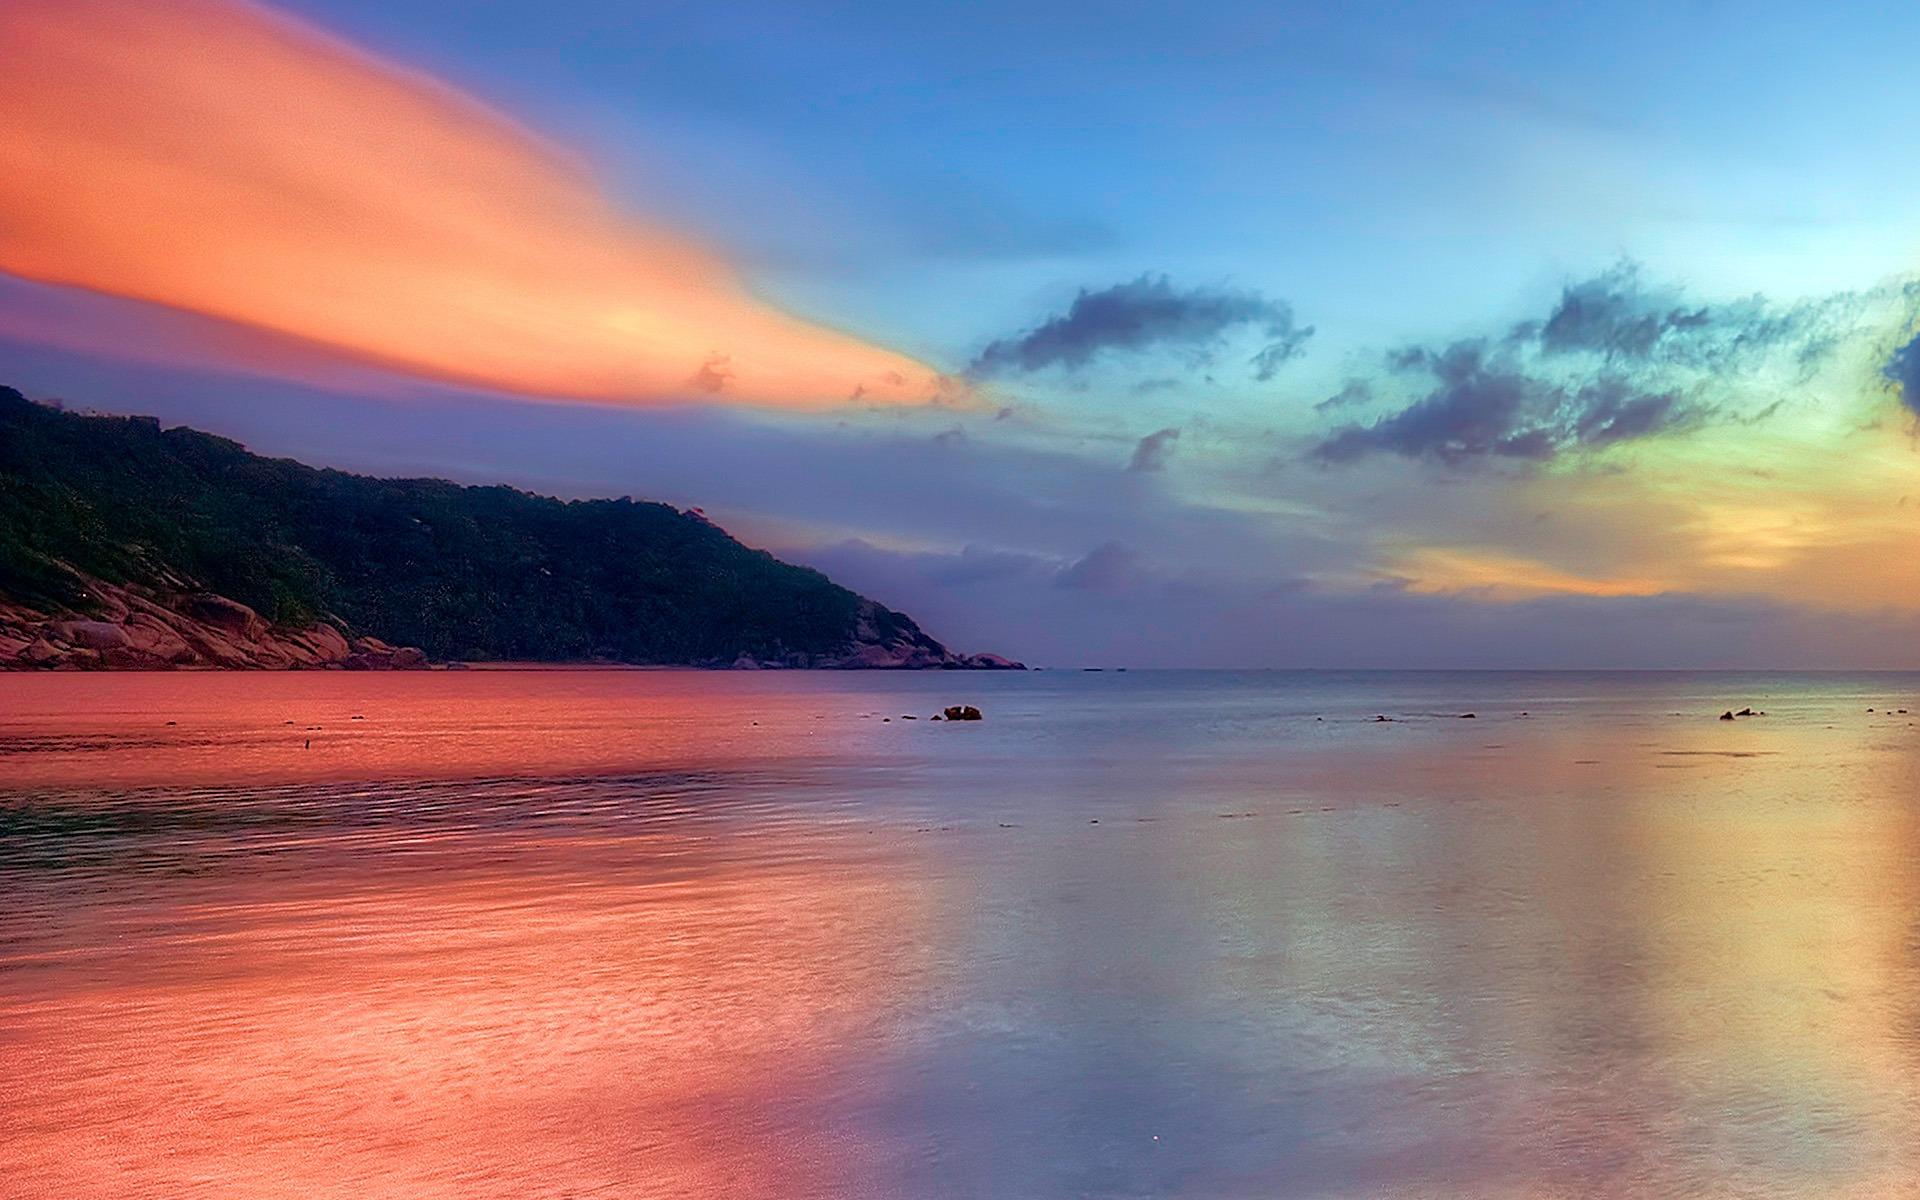 Thailand Sunset-Windows 10 HD Wallpaper-1920x1200 Download ...